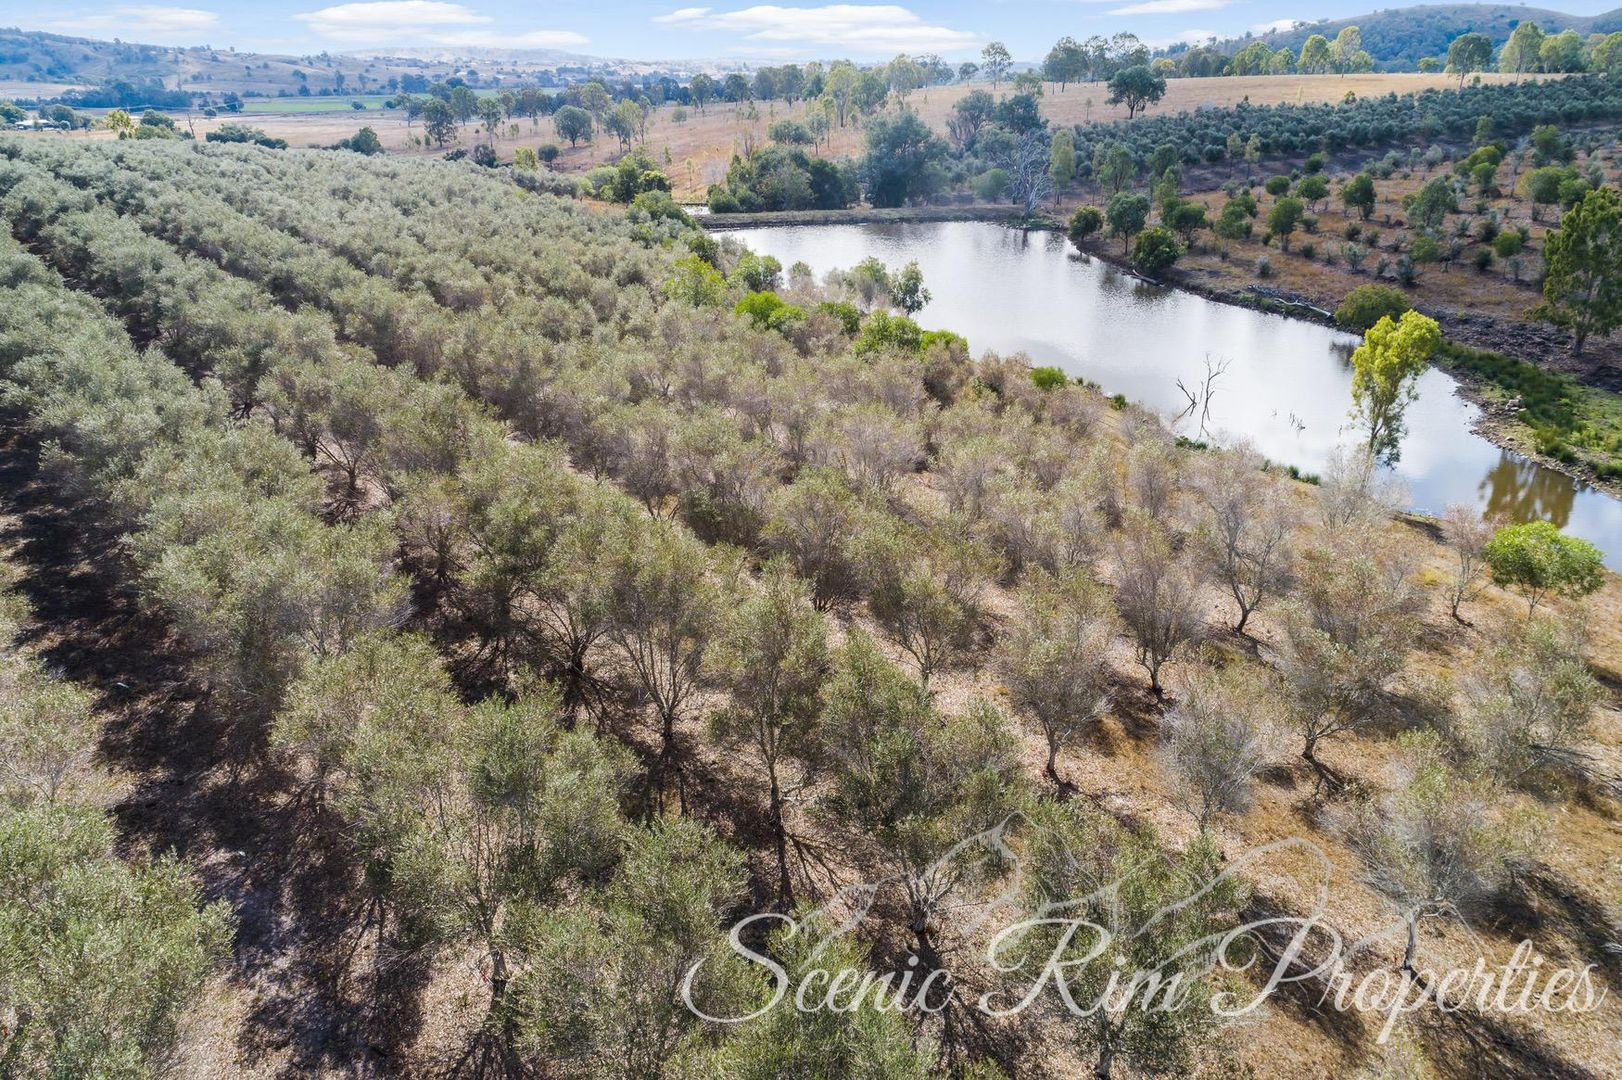 585 Boonah Rathdowney Road, Dugandan QLD 4310, Image 1